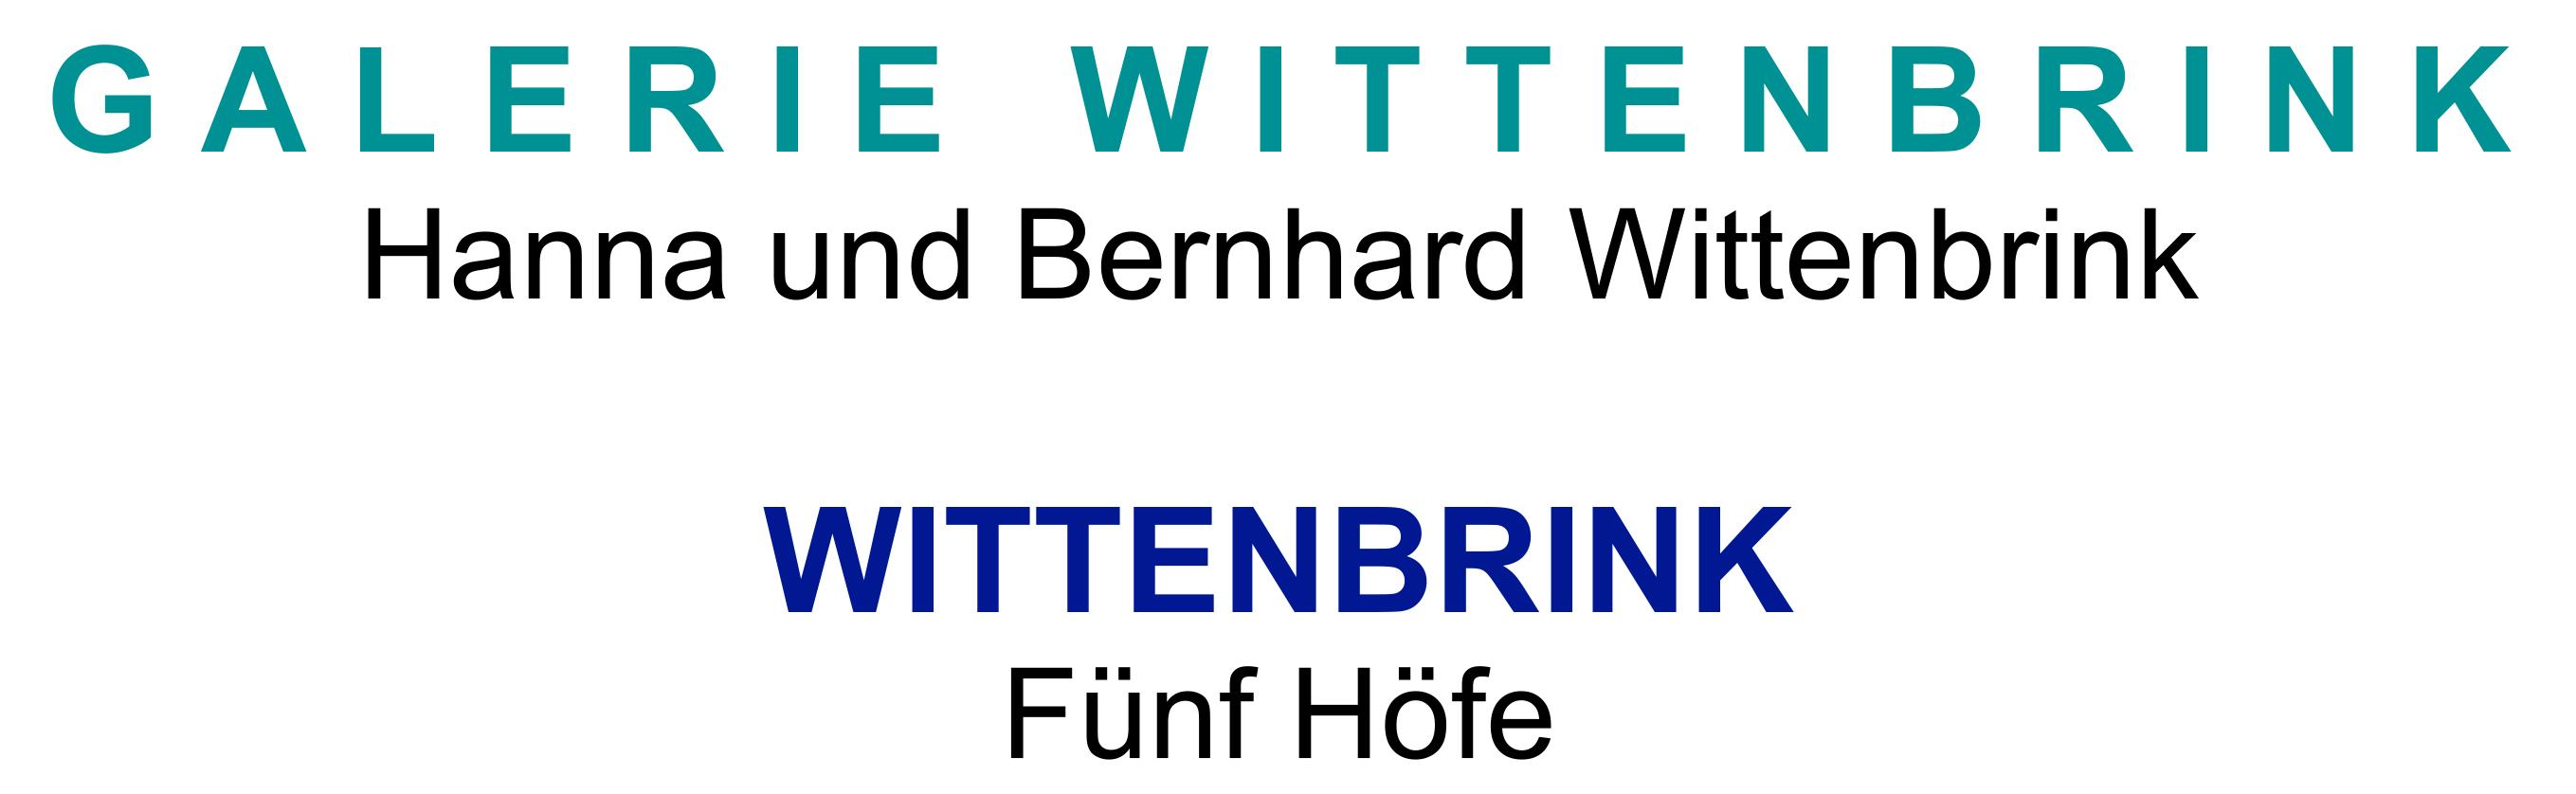 Galeria Wittenbrink Munich